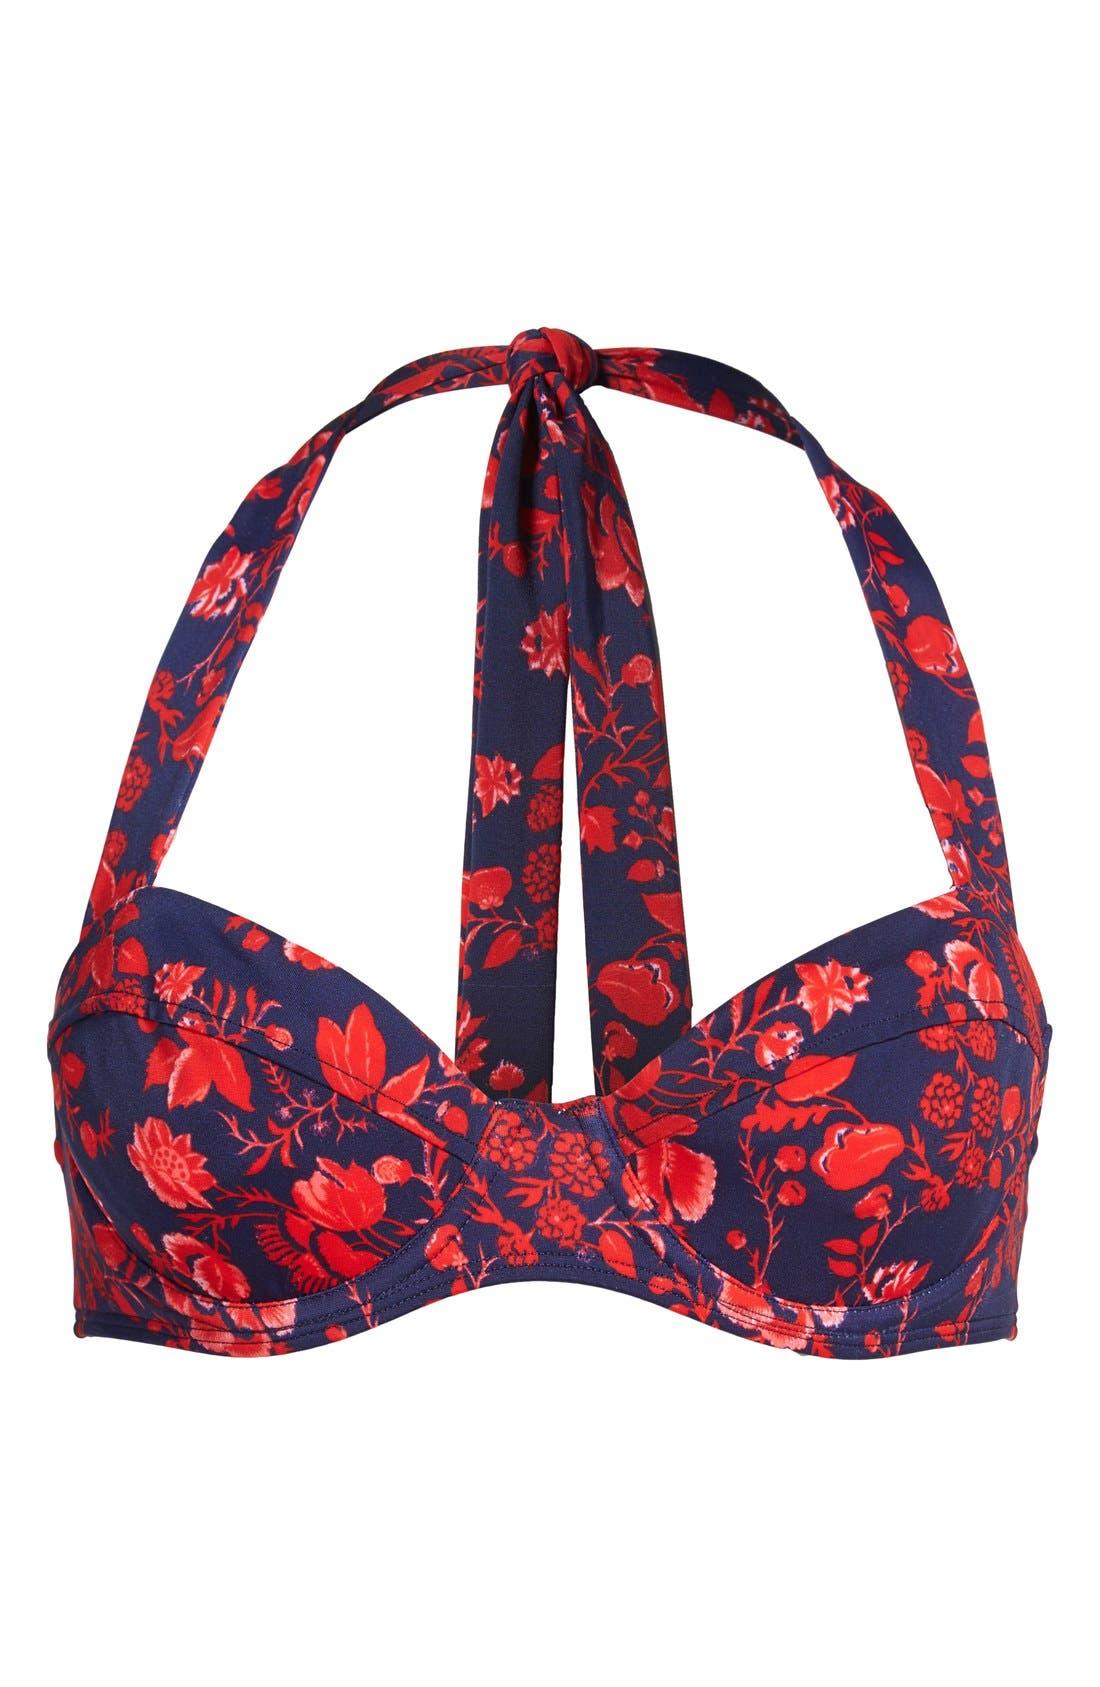 Main Image - Pret-à-Surf Retro Bikini Top